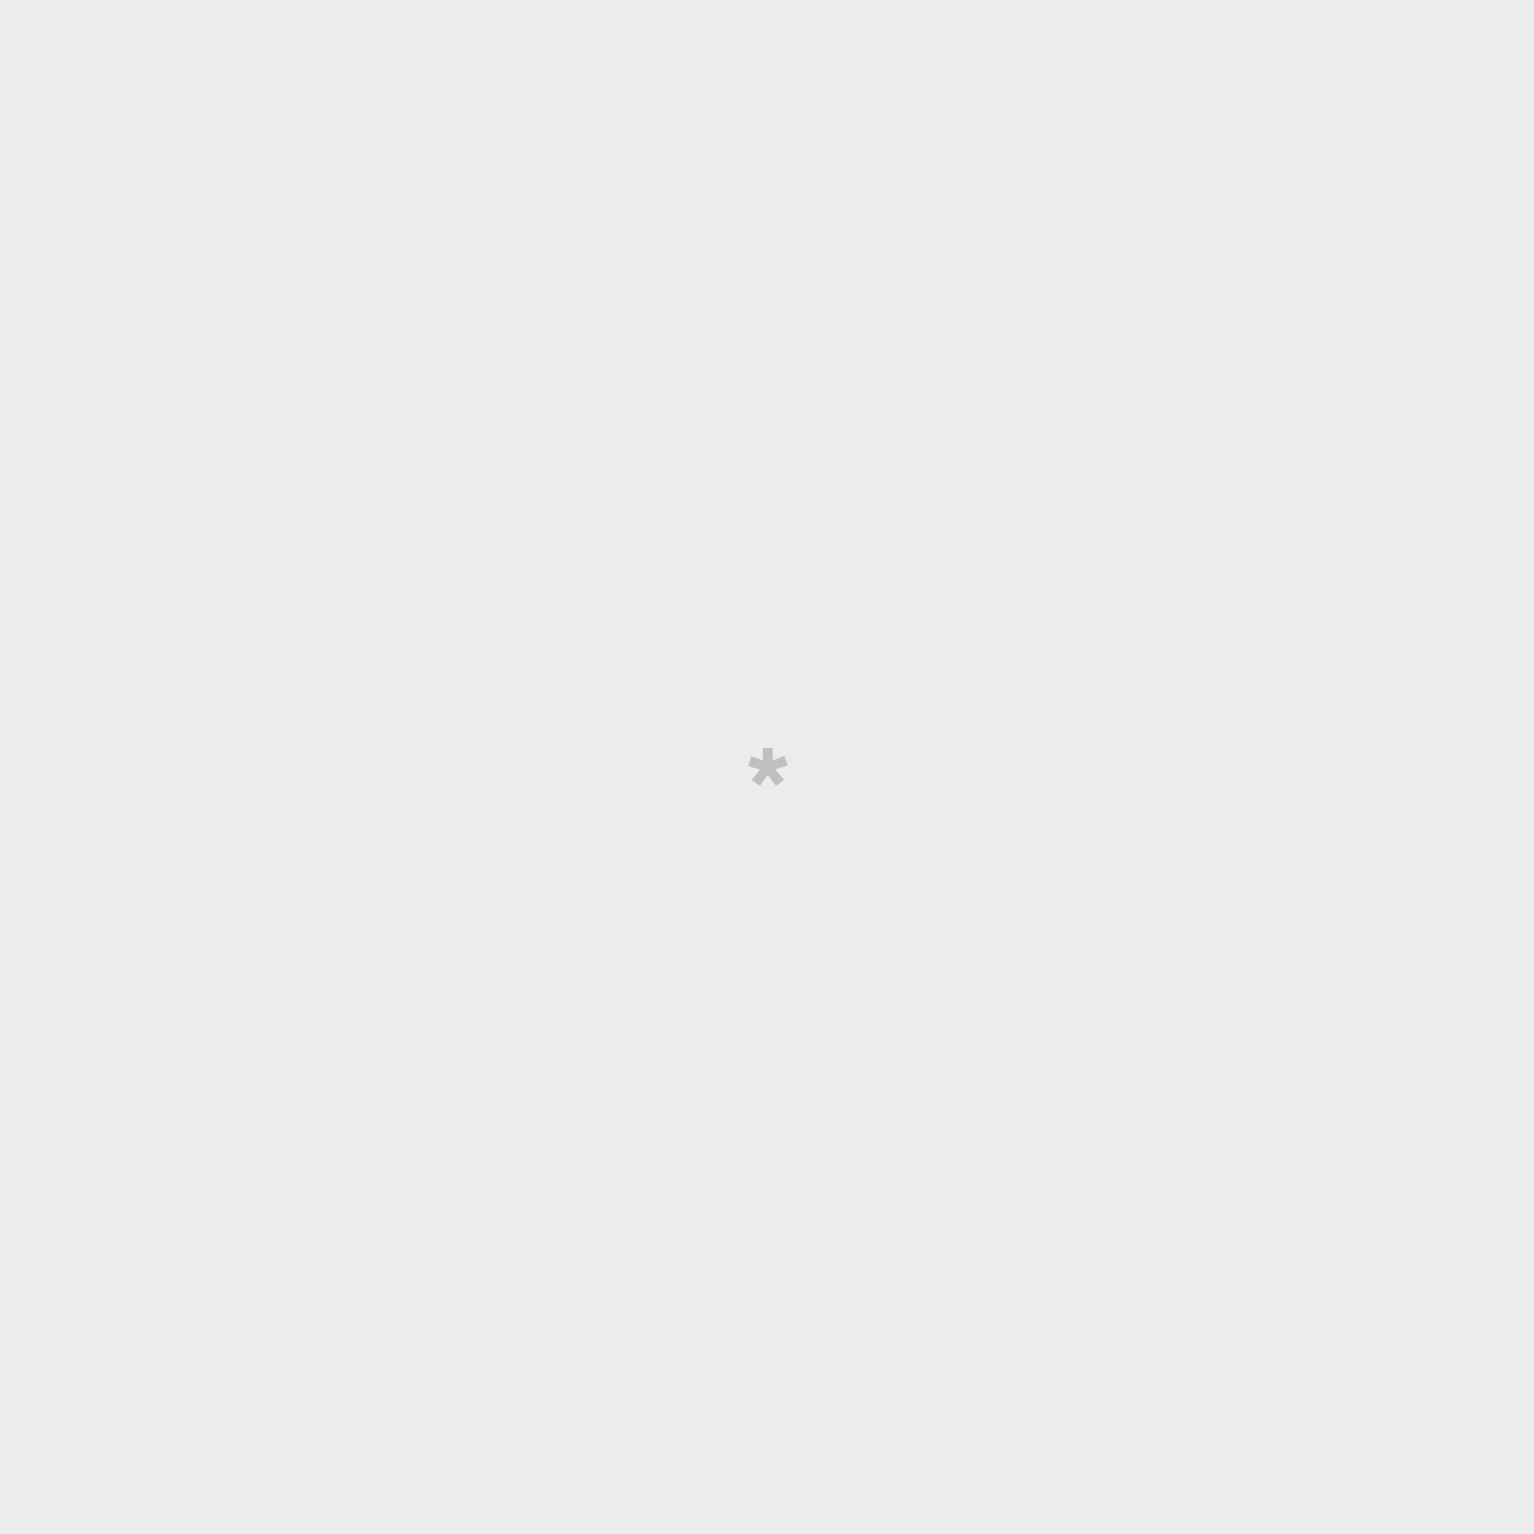 Jogo de lençóis cama de 90 cm - Siestas & Fiestas